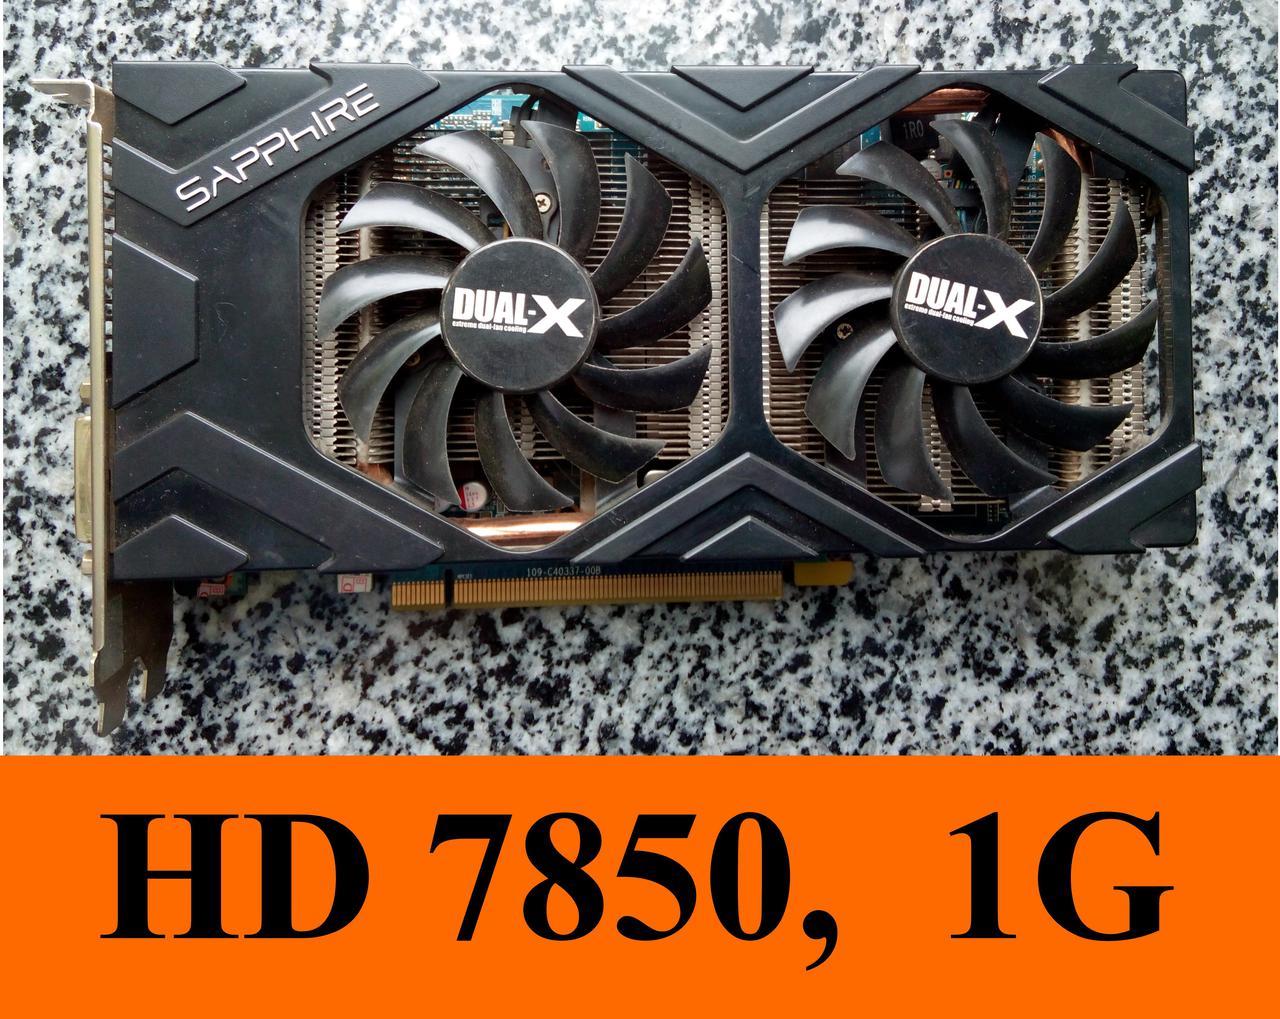 Видеокарты Sapphire HD 7850, 1Gb, 256bit, GDDR5    (GTX 480, 570, 660 HD 6970 R9 270)